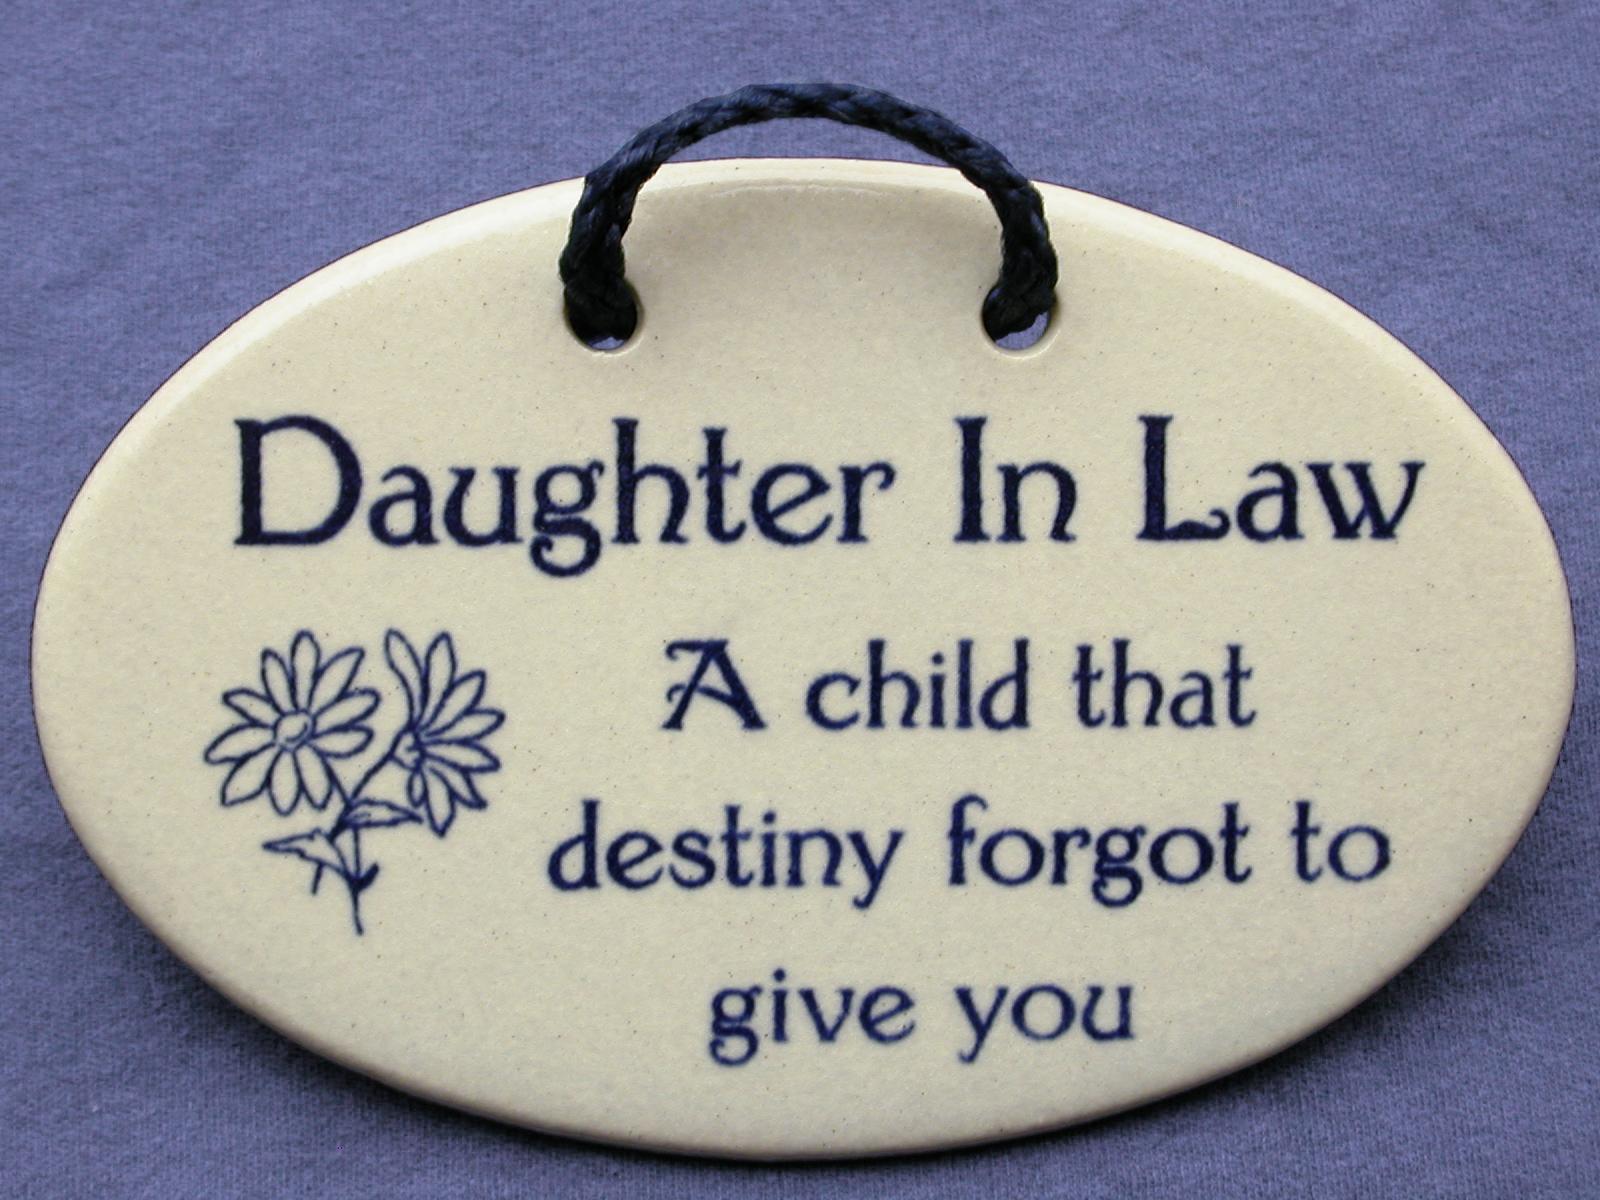 2265P daughter in law destiny